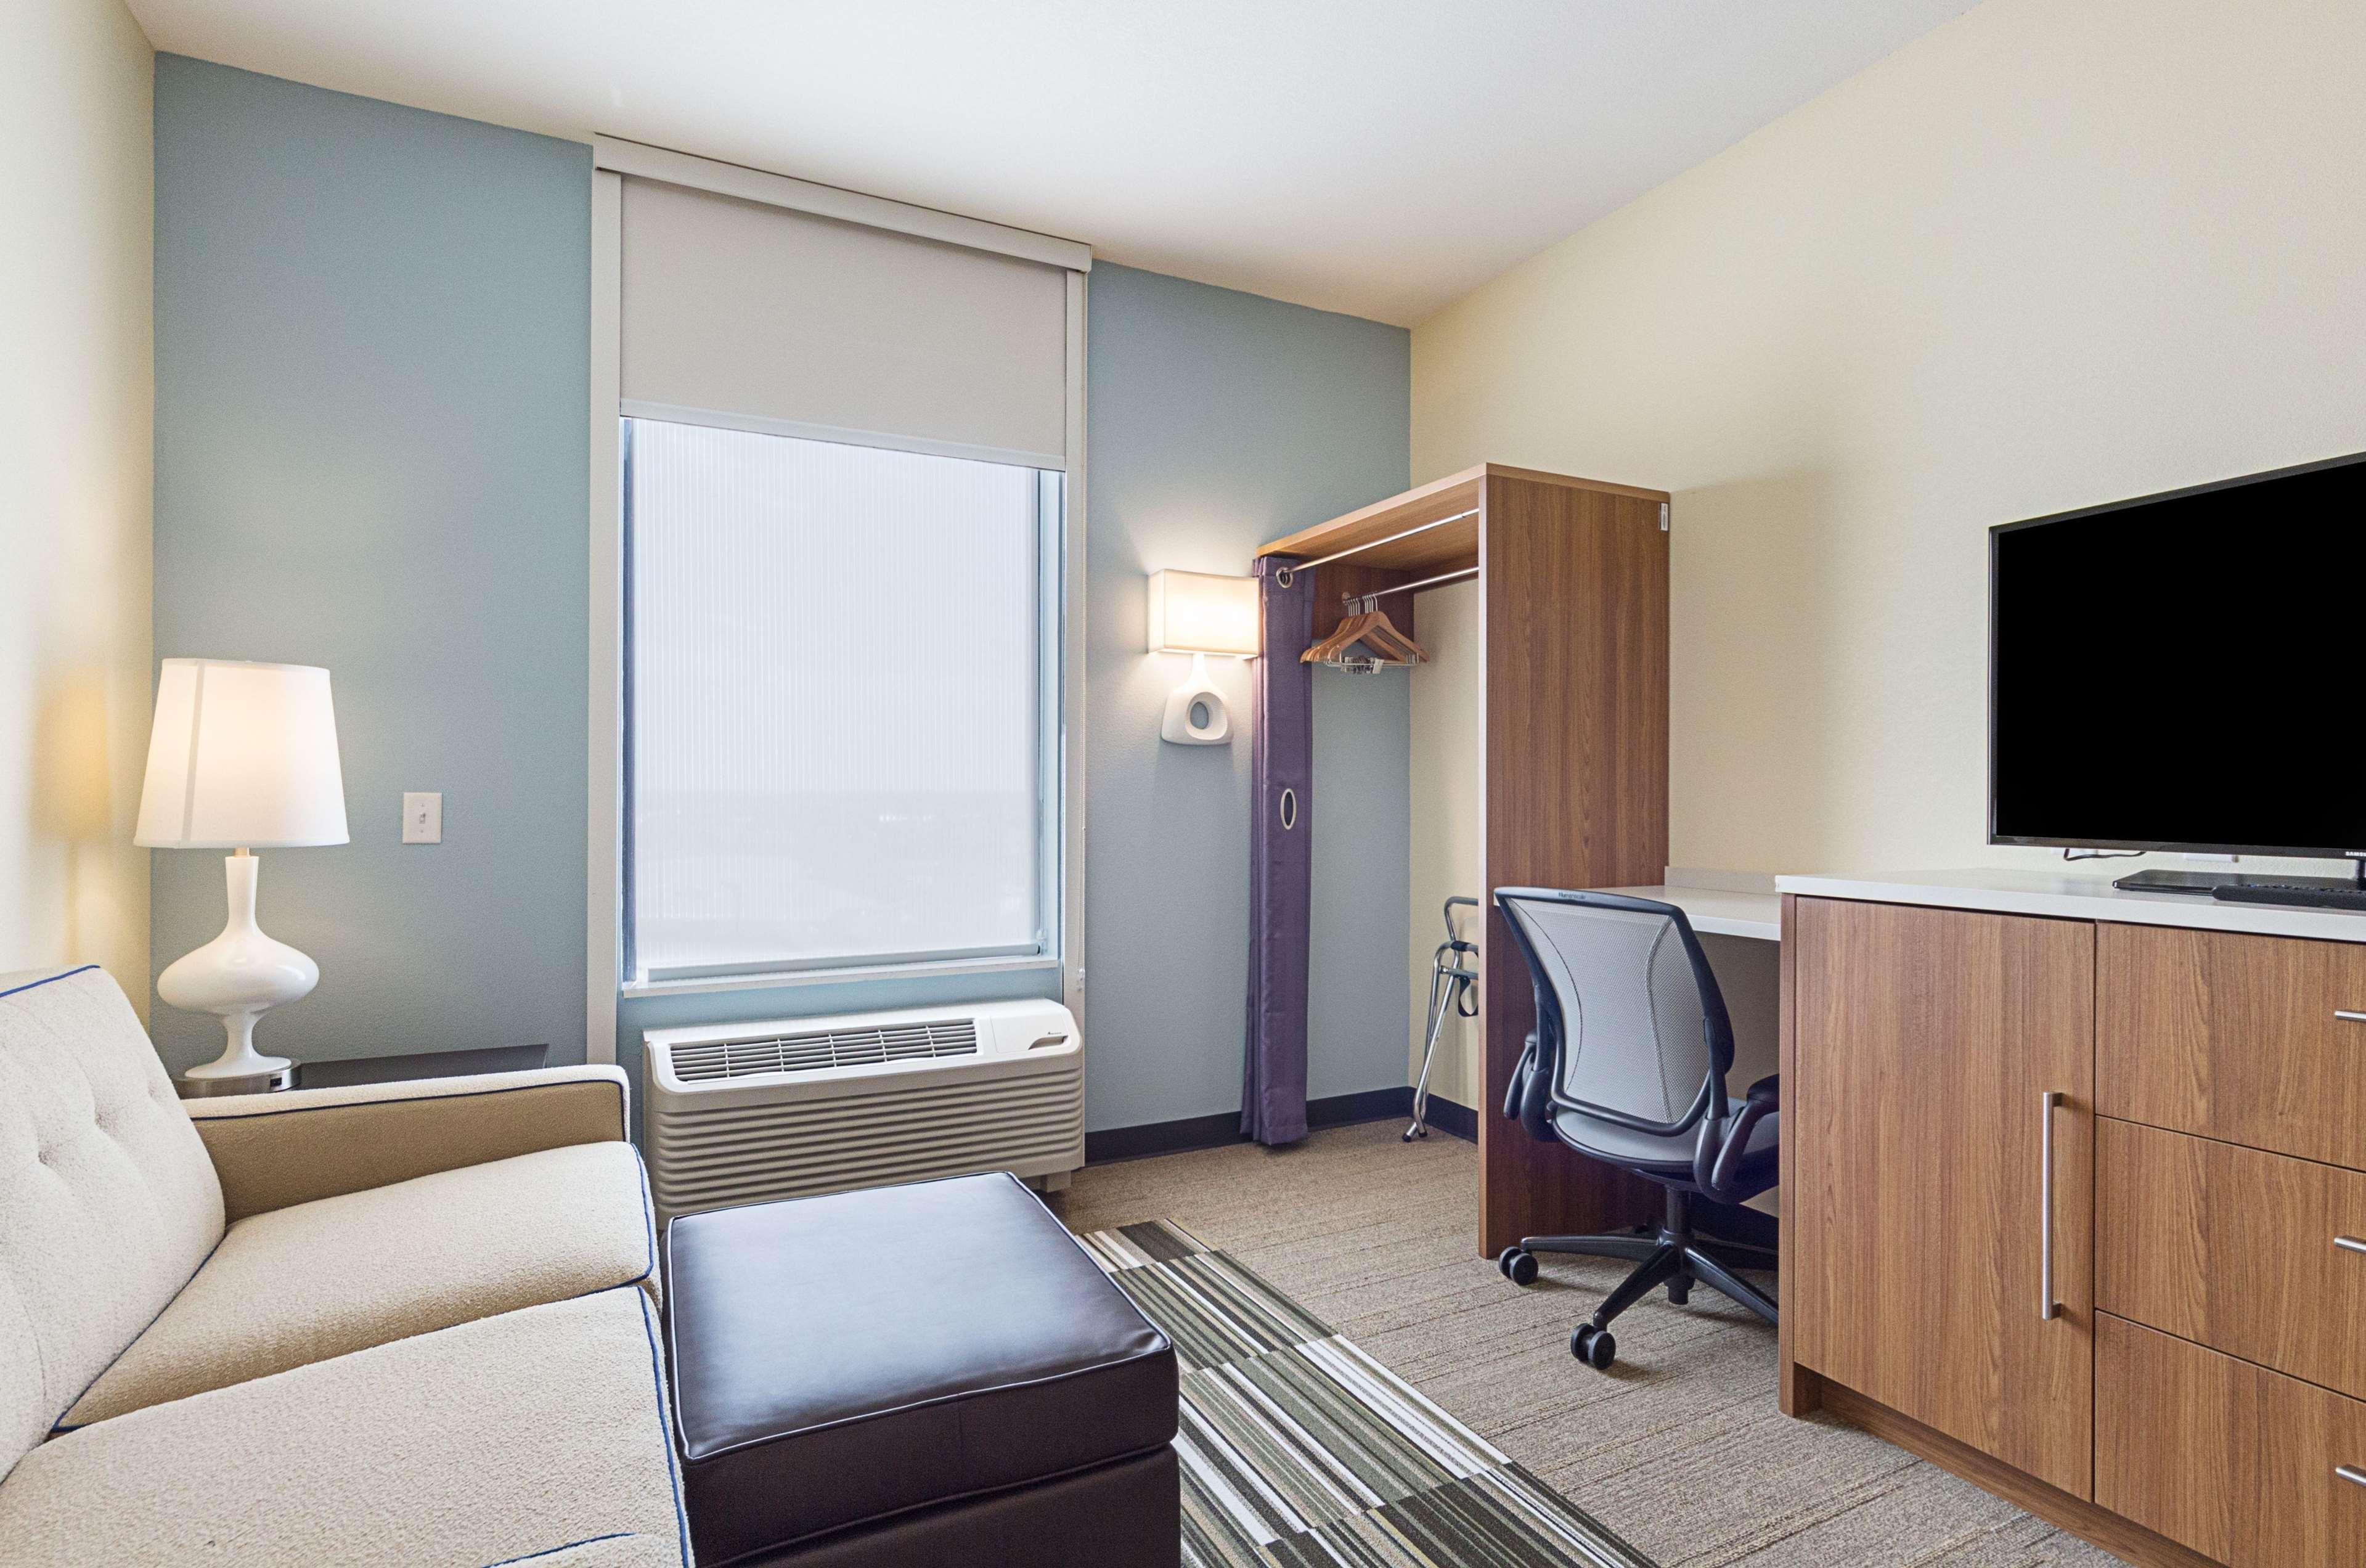 Home 2 Suites by Hilton - Yukon image 43